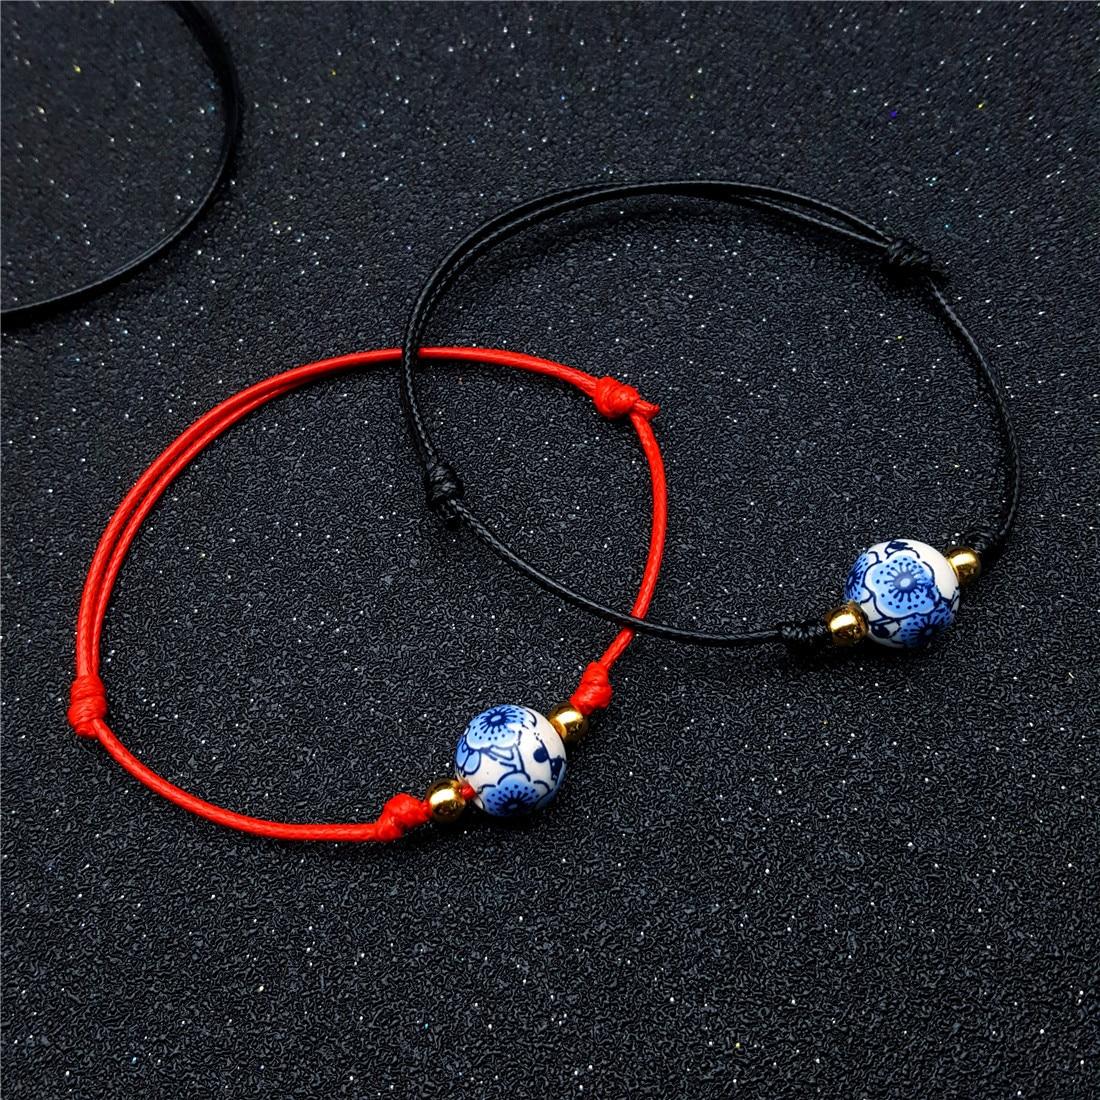 Chinese Ceramics Beads Bracelet & Bangle For Women man couple Adjustable black/red rope Charm Ethnic hand Jewelry lover Gift men beaded bracelet red